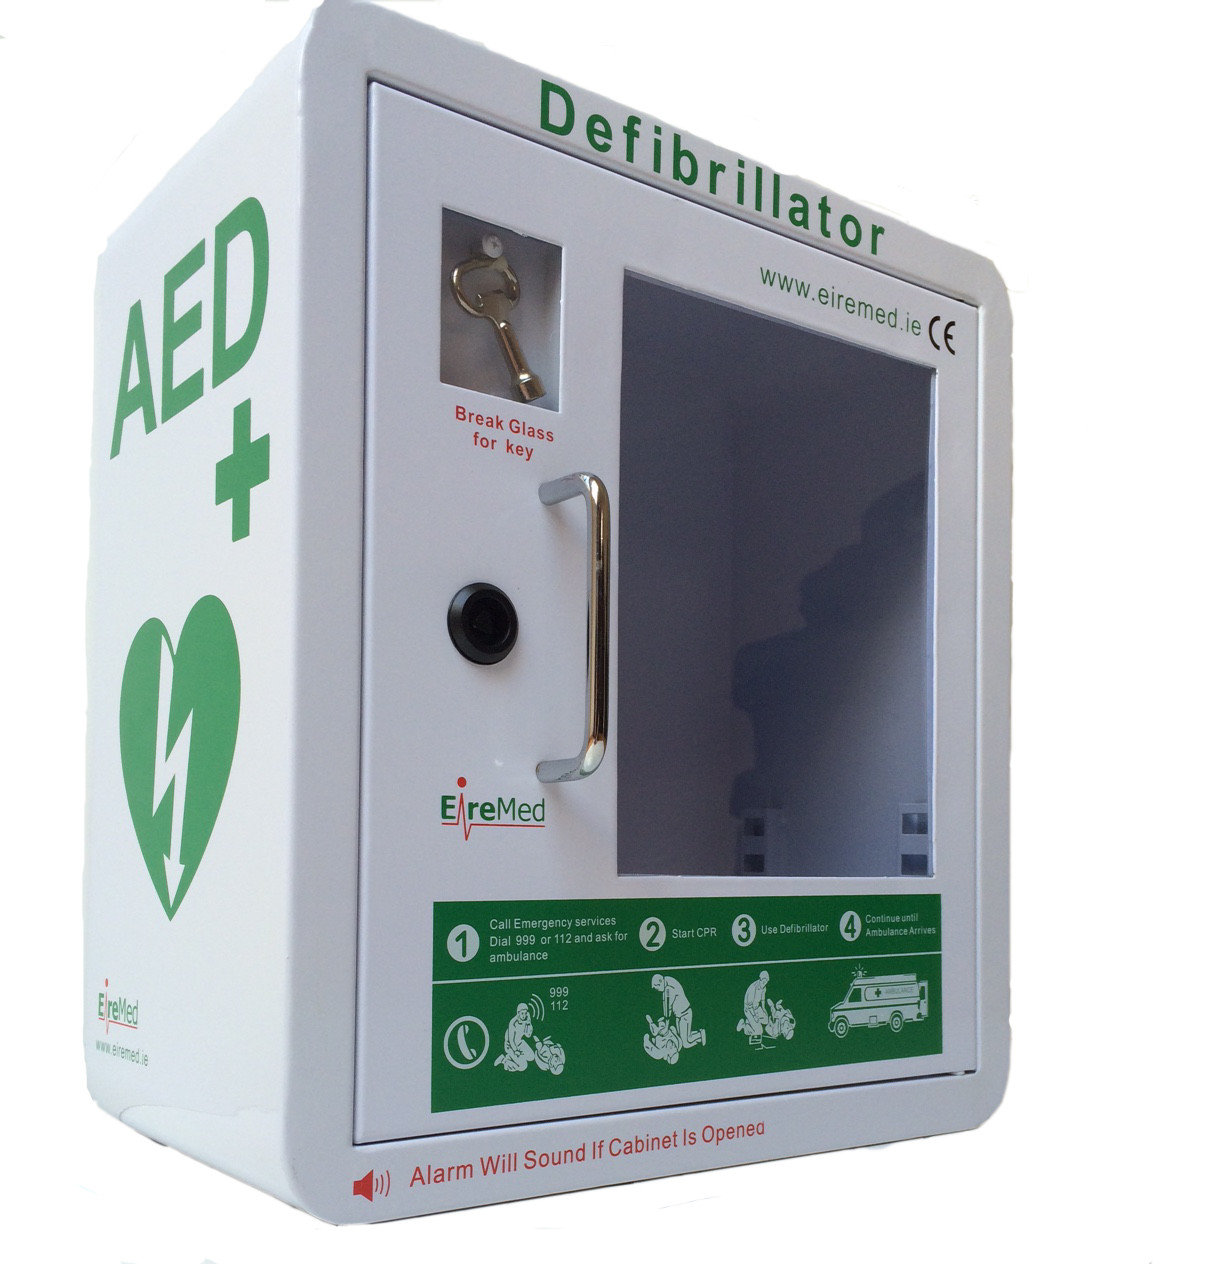 Defibrillator Cabinet Key Cabinets Matttroy